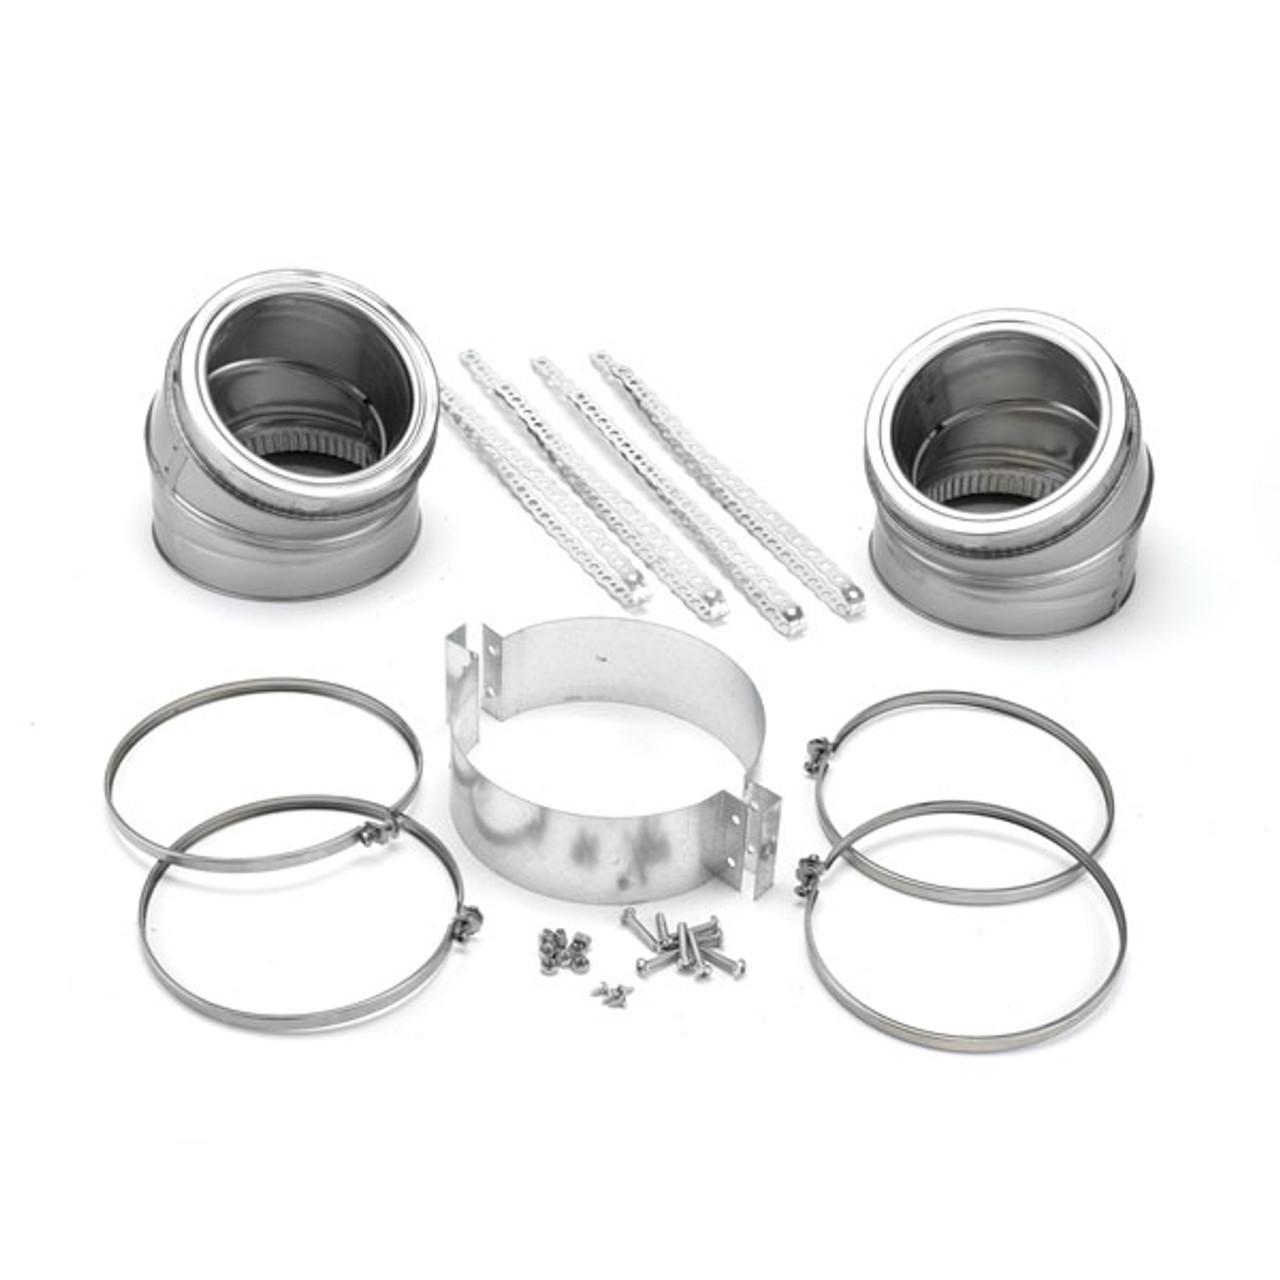 SuperProChimney Elbow Kit - 15 degree insulated